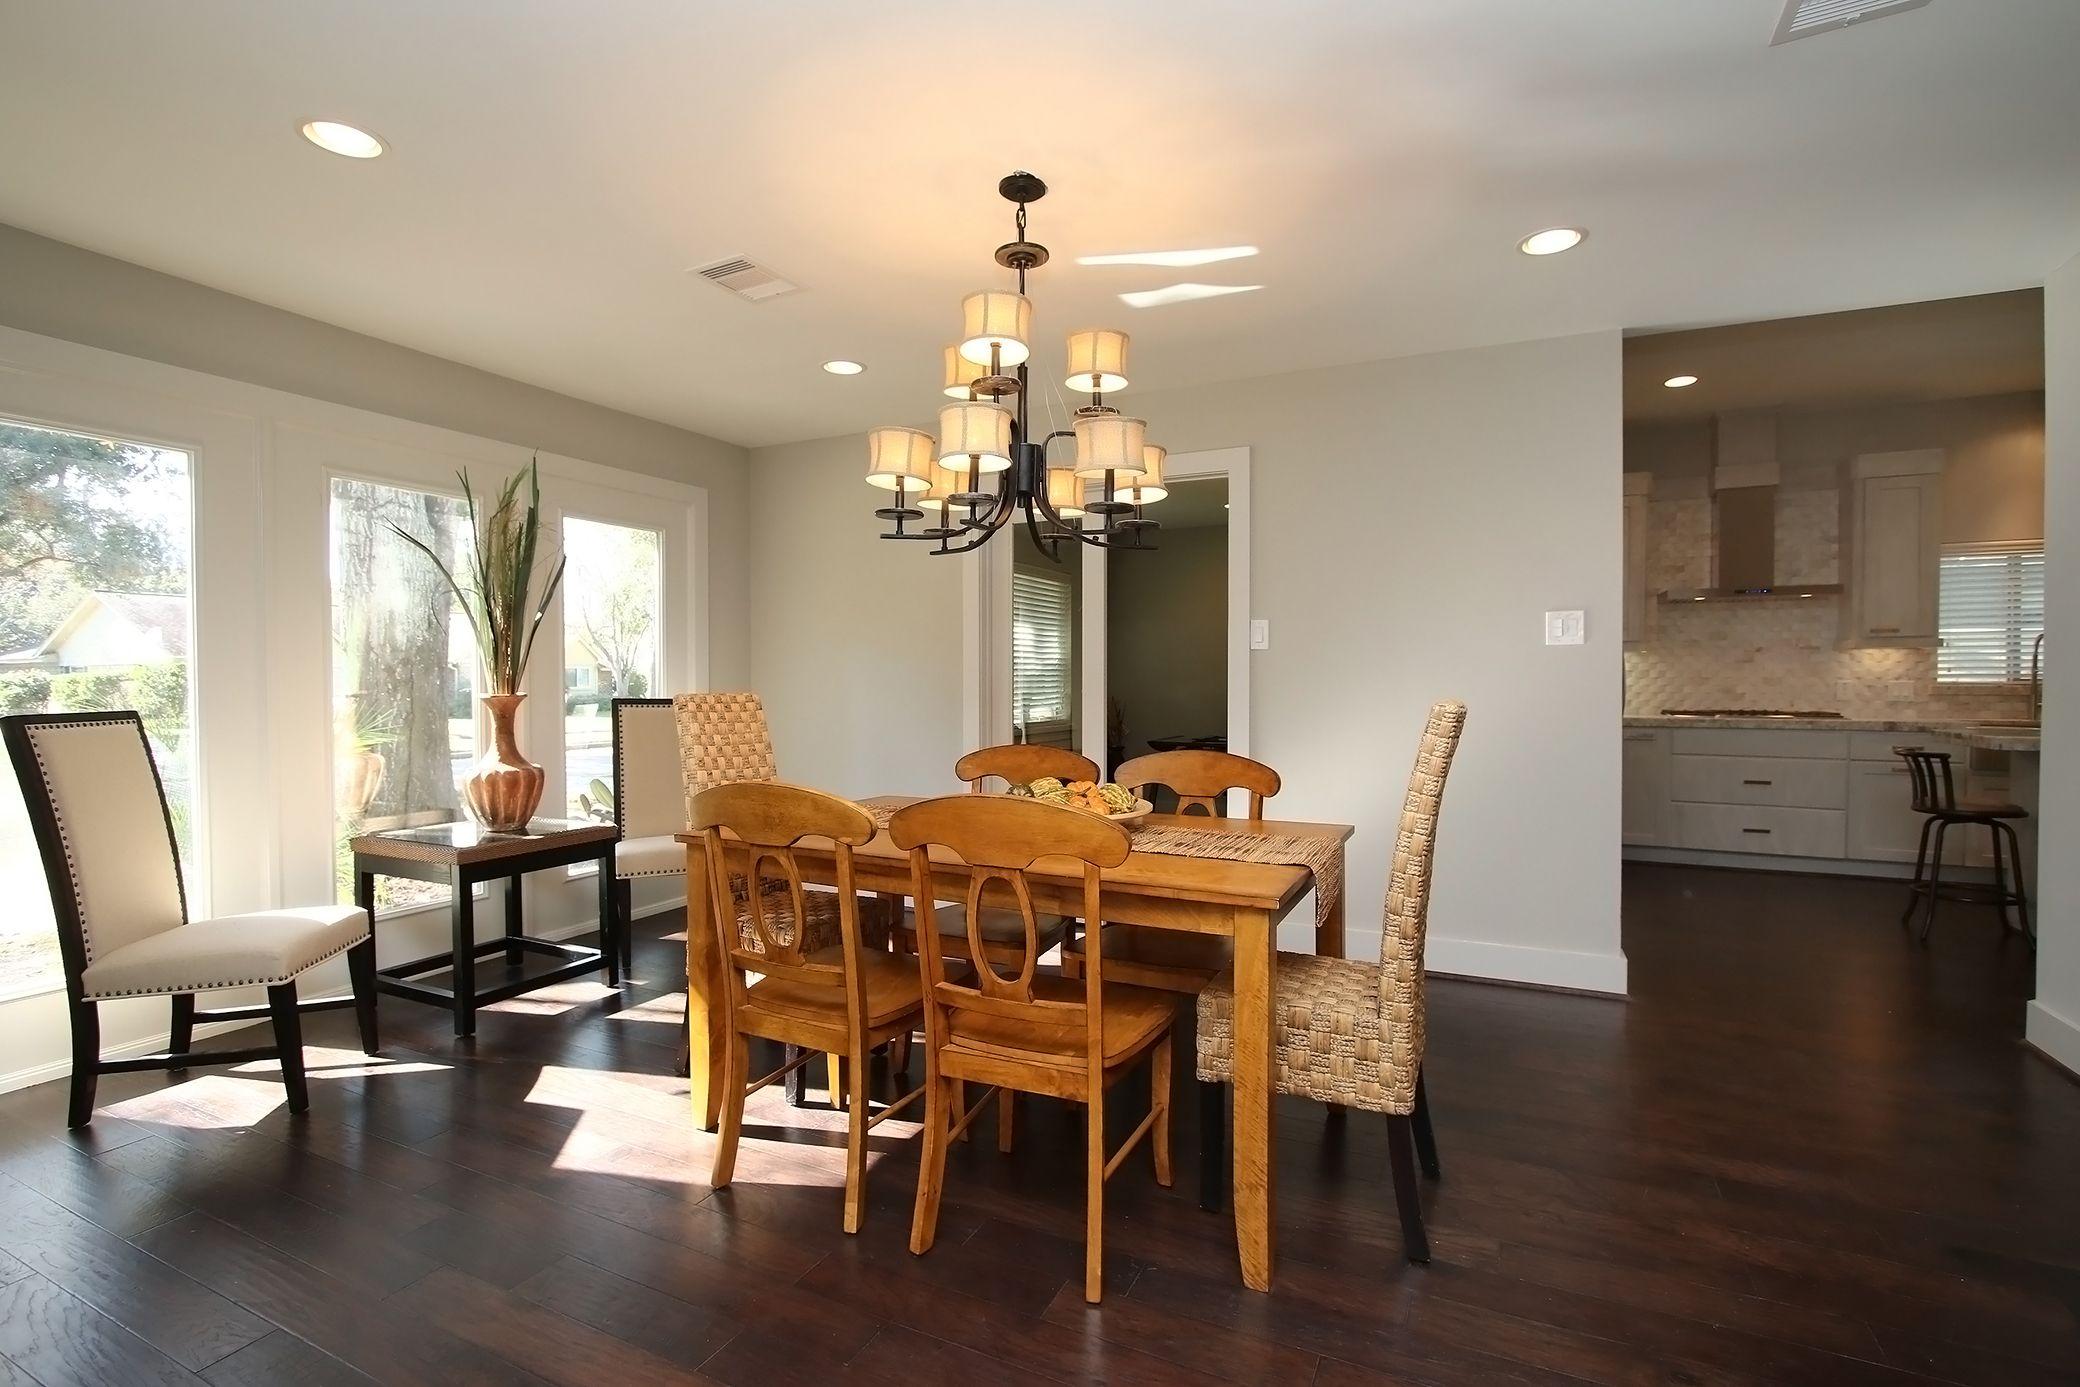 Birdo Place Short Term Rental Houston Home, House rental